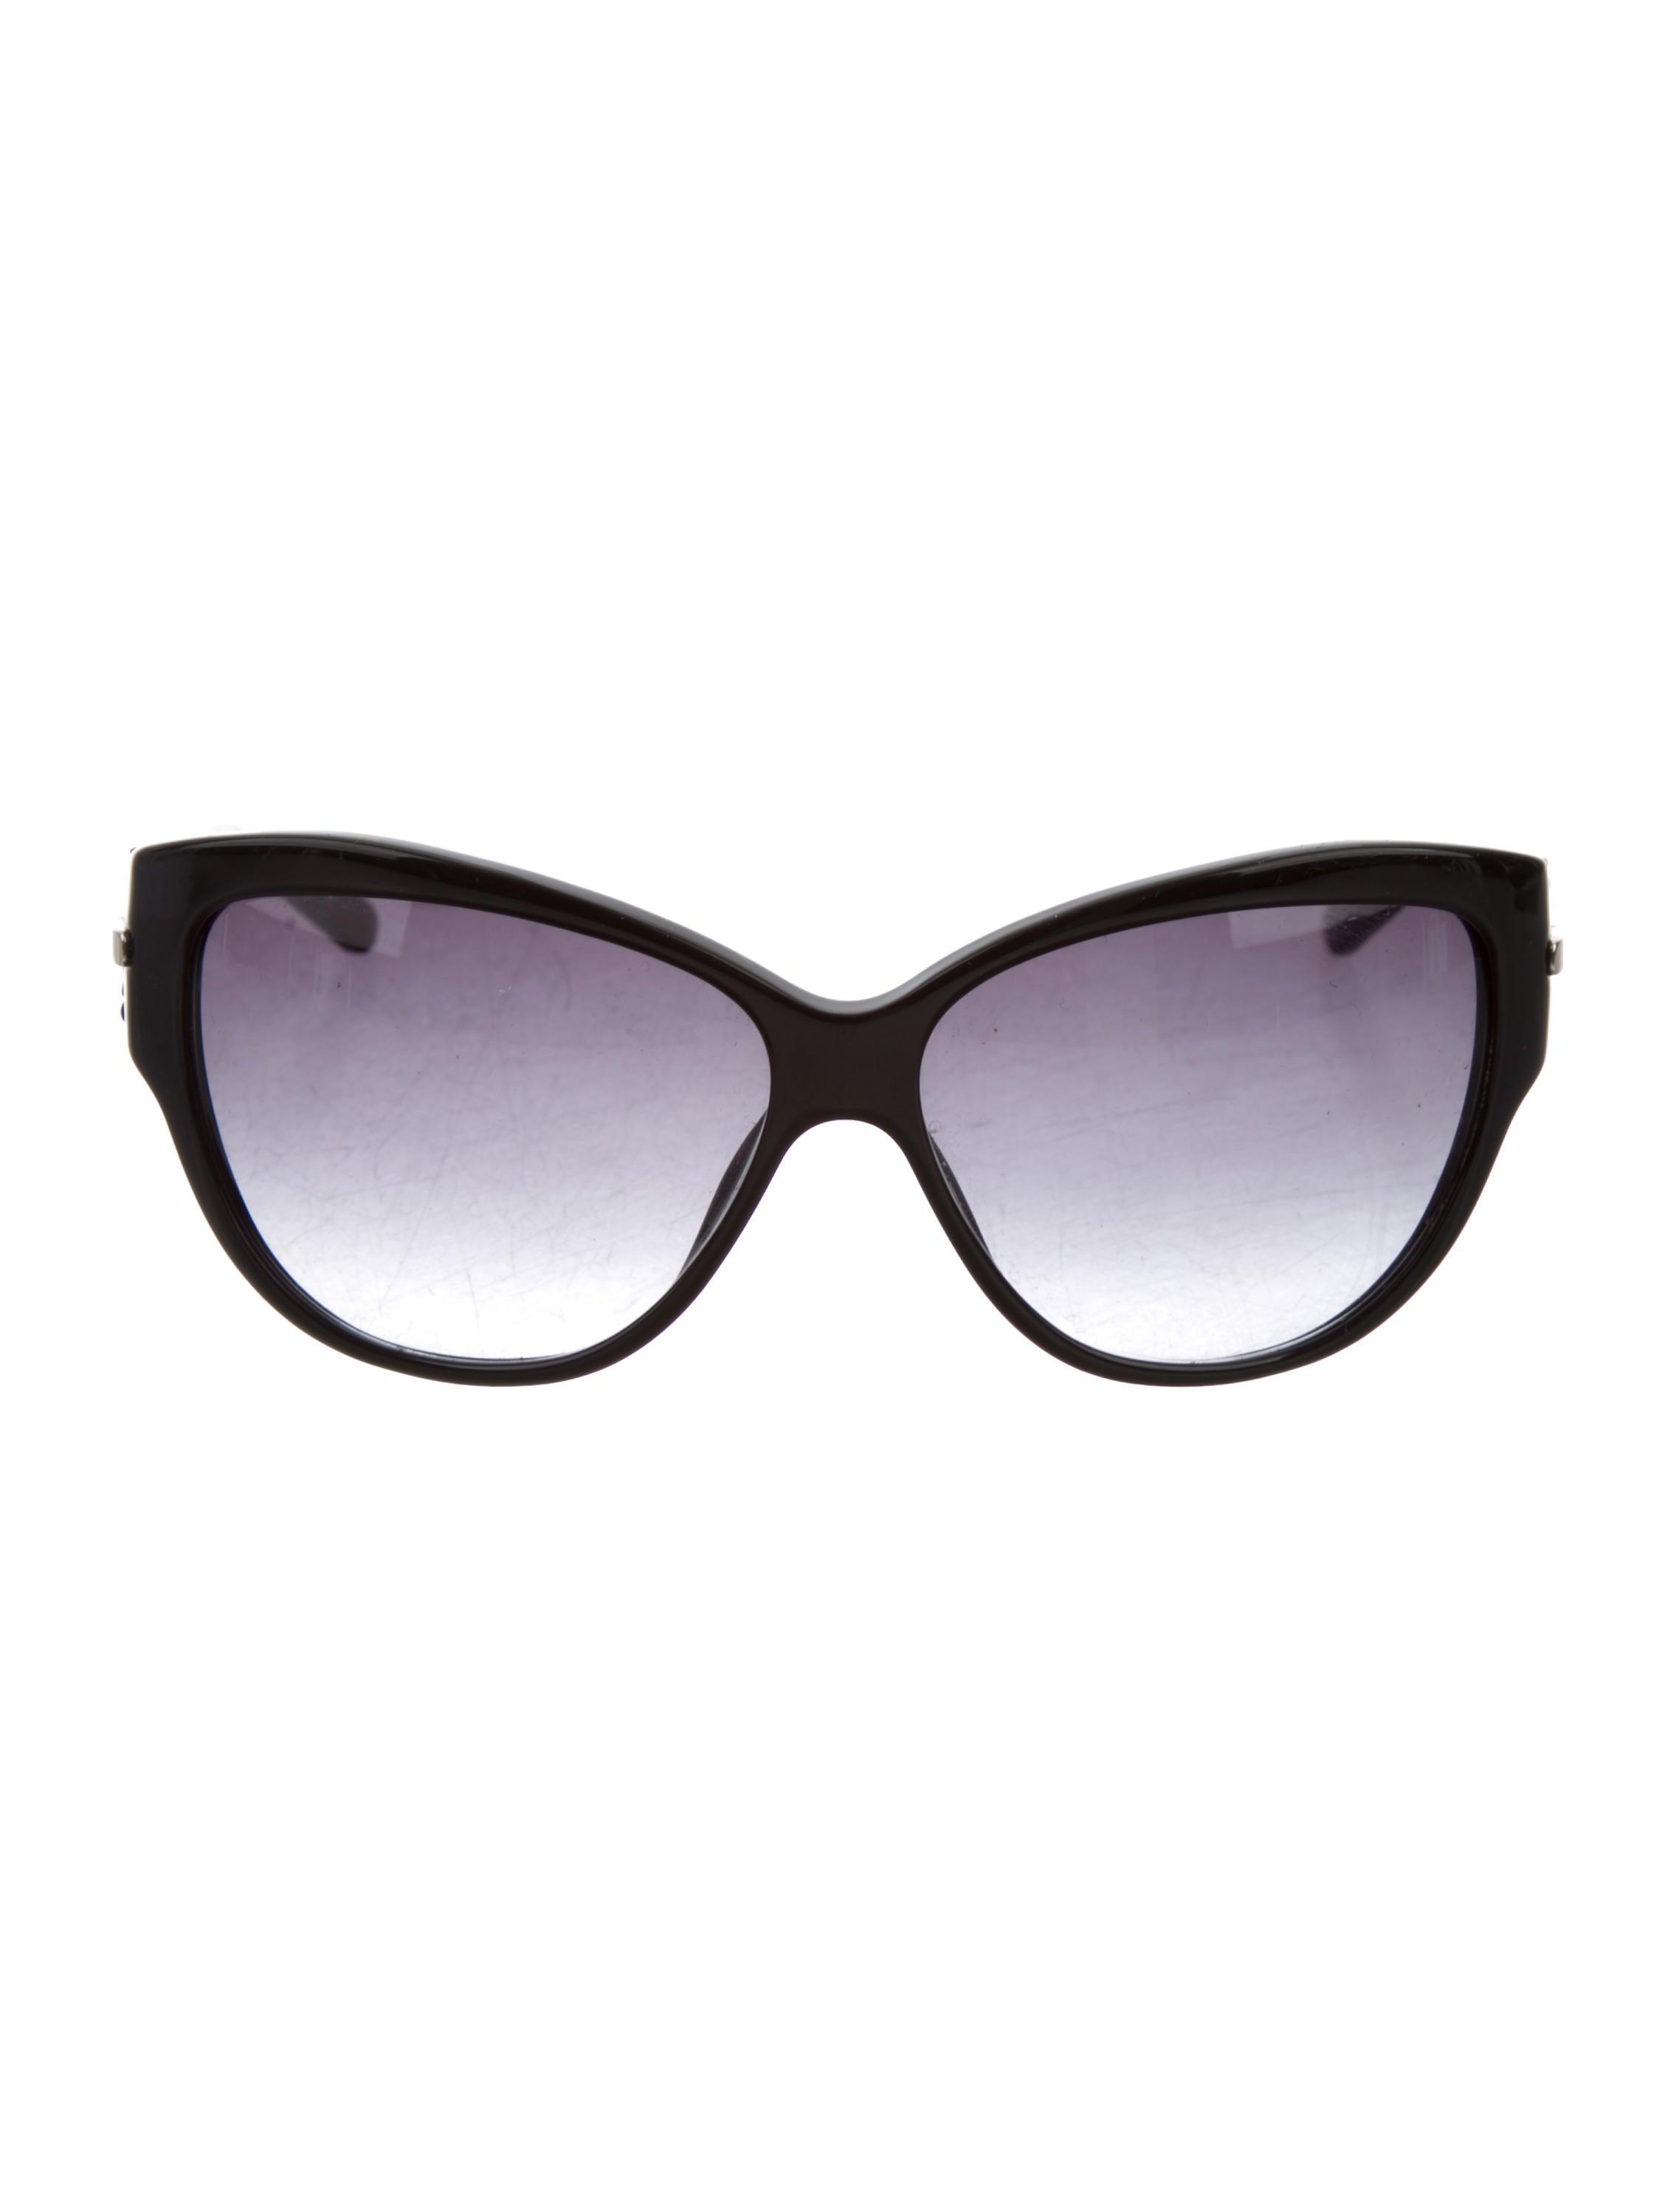 b789f997c655 Christian Dior My Lady Dior 5 Sunglasses - Accessories - CHR40658 ...